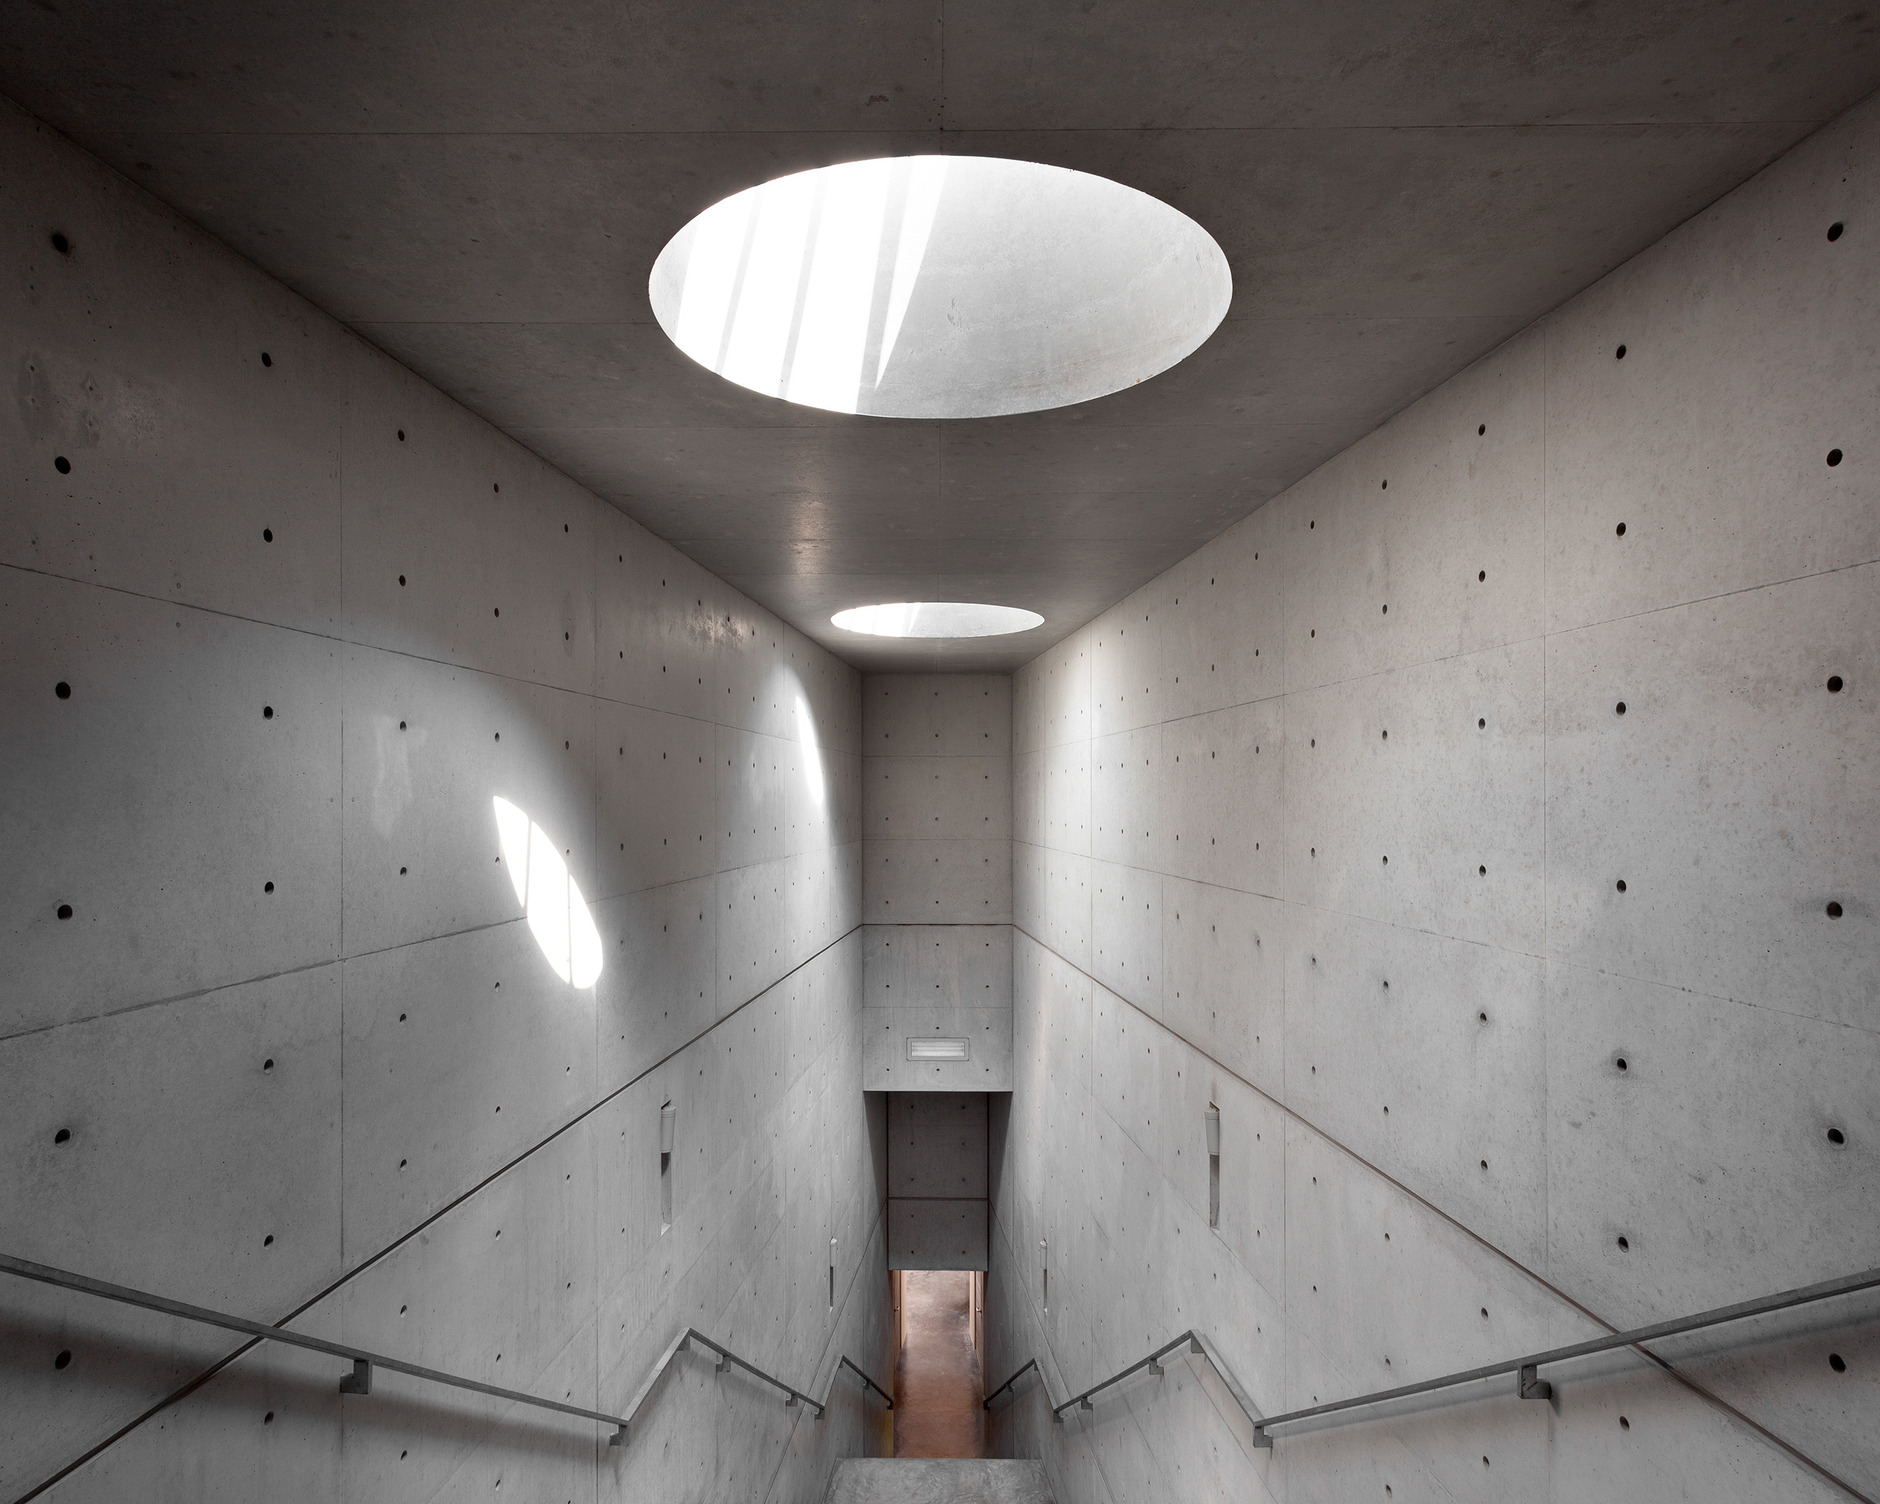 Архитектор Тадао Андо: певец бетона (галерея 15, фото 4)